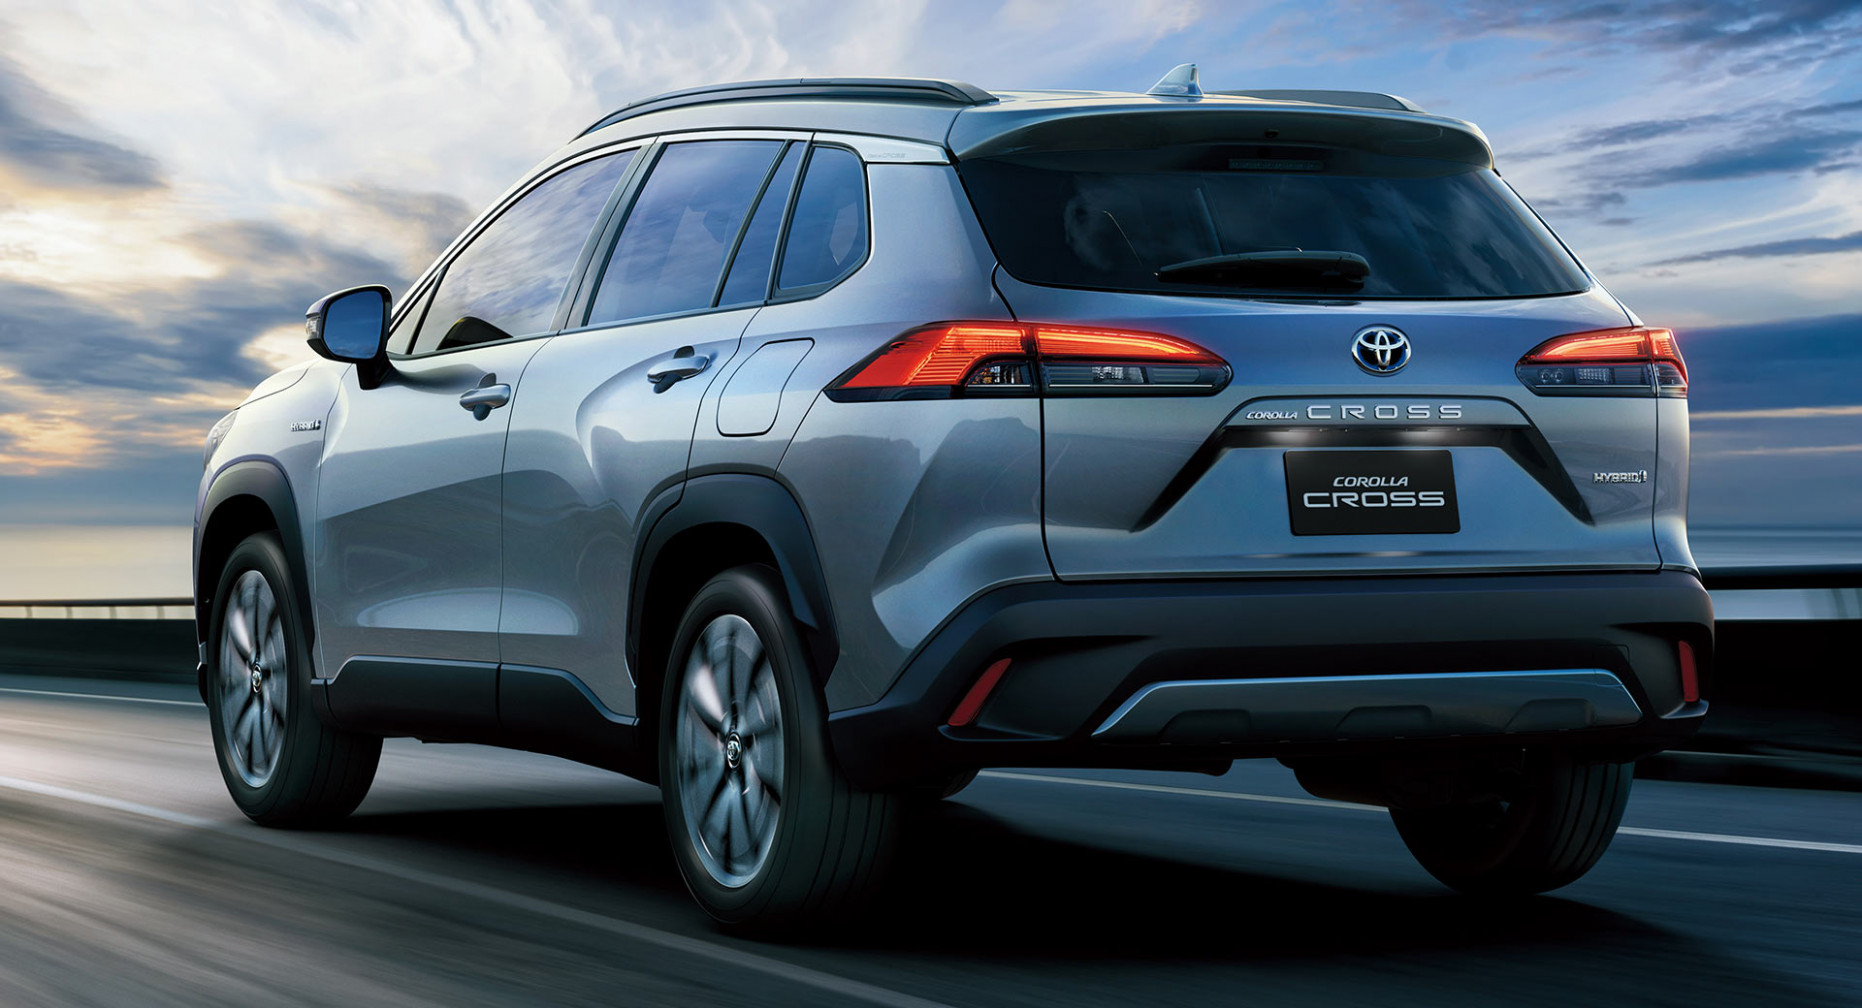 Rumors 2022 Toyota Corolla